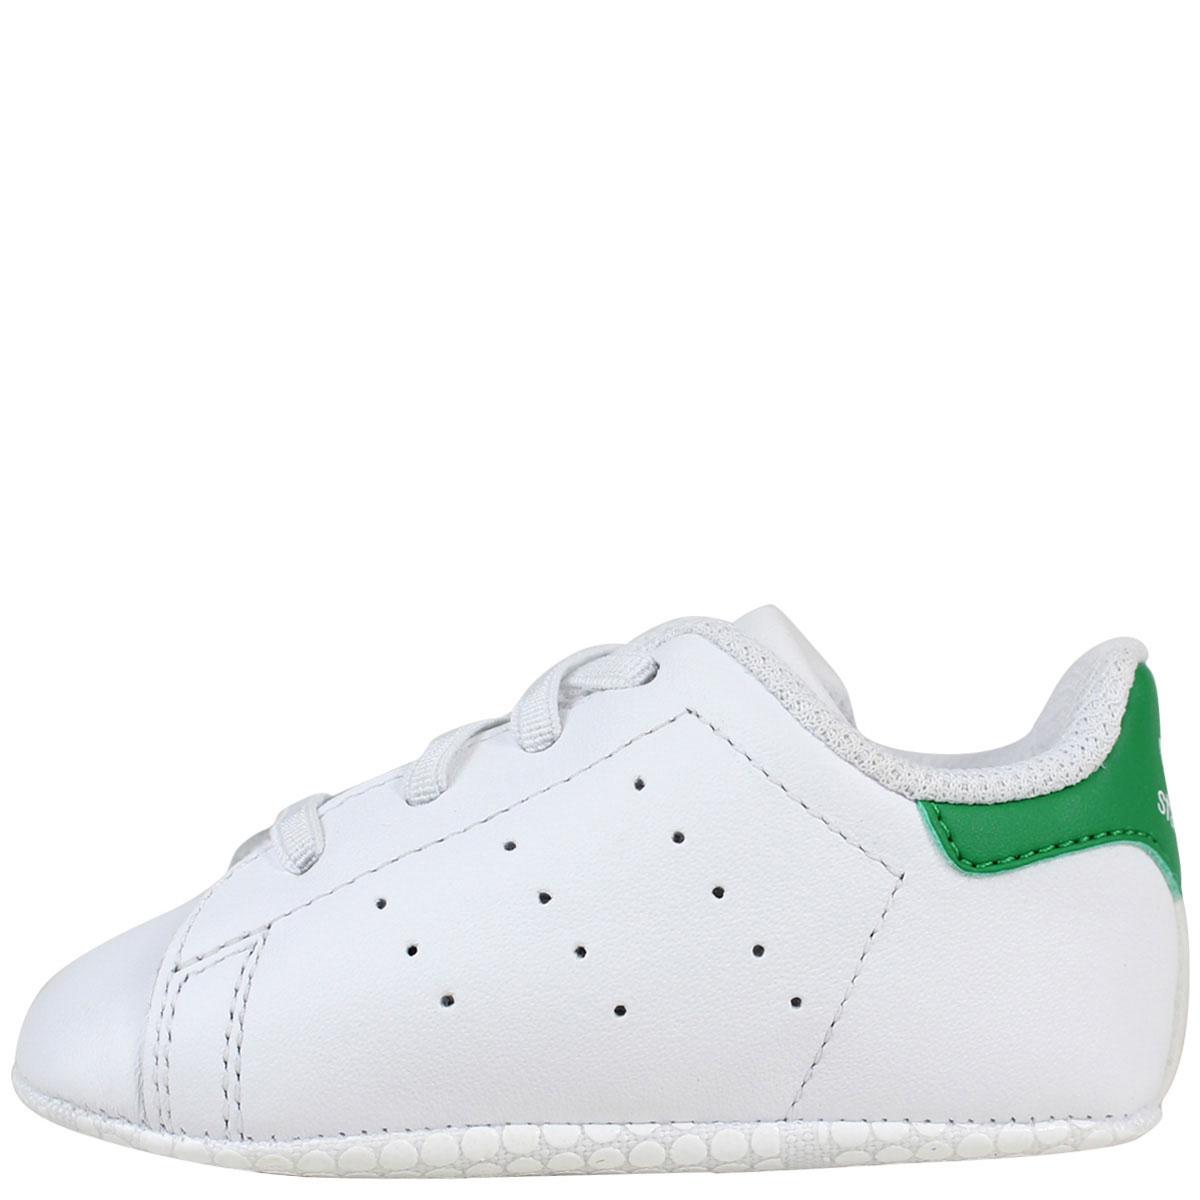 adidas Originals STAN SMITH CRIB スタンスミス キッズ ベビー アディダス オリジナルス スニーカー 靴 B24101 ホワイト [1/25 追加入荷] [191]